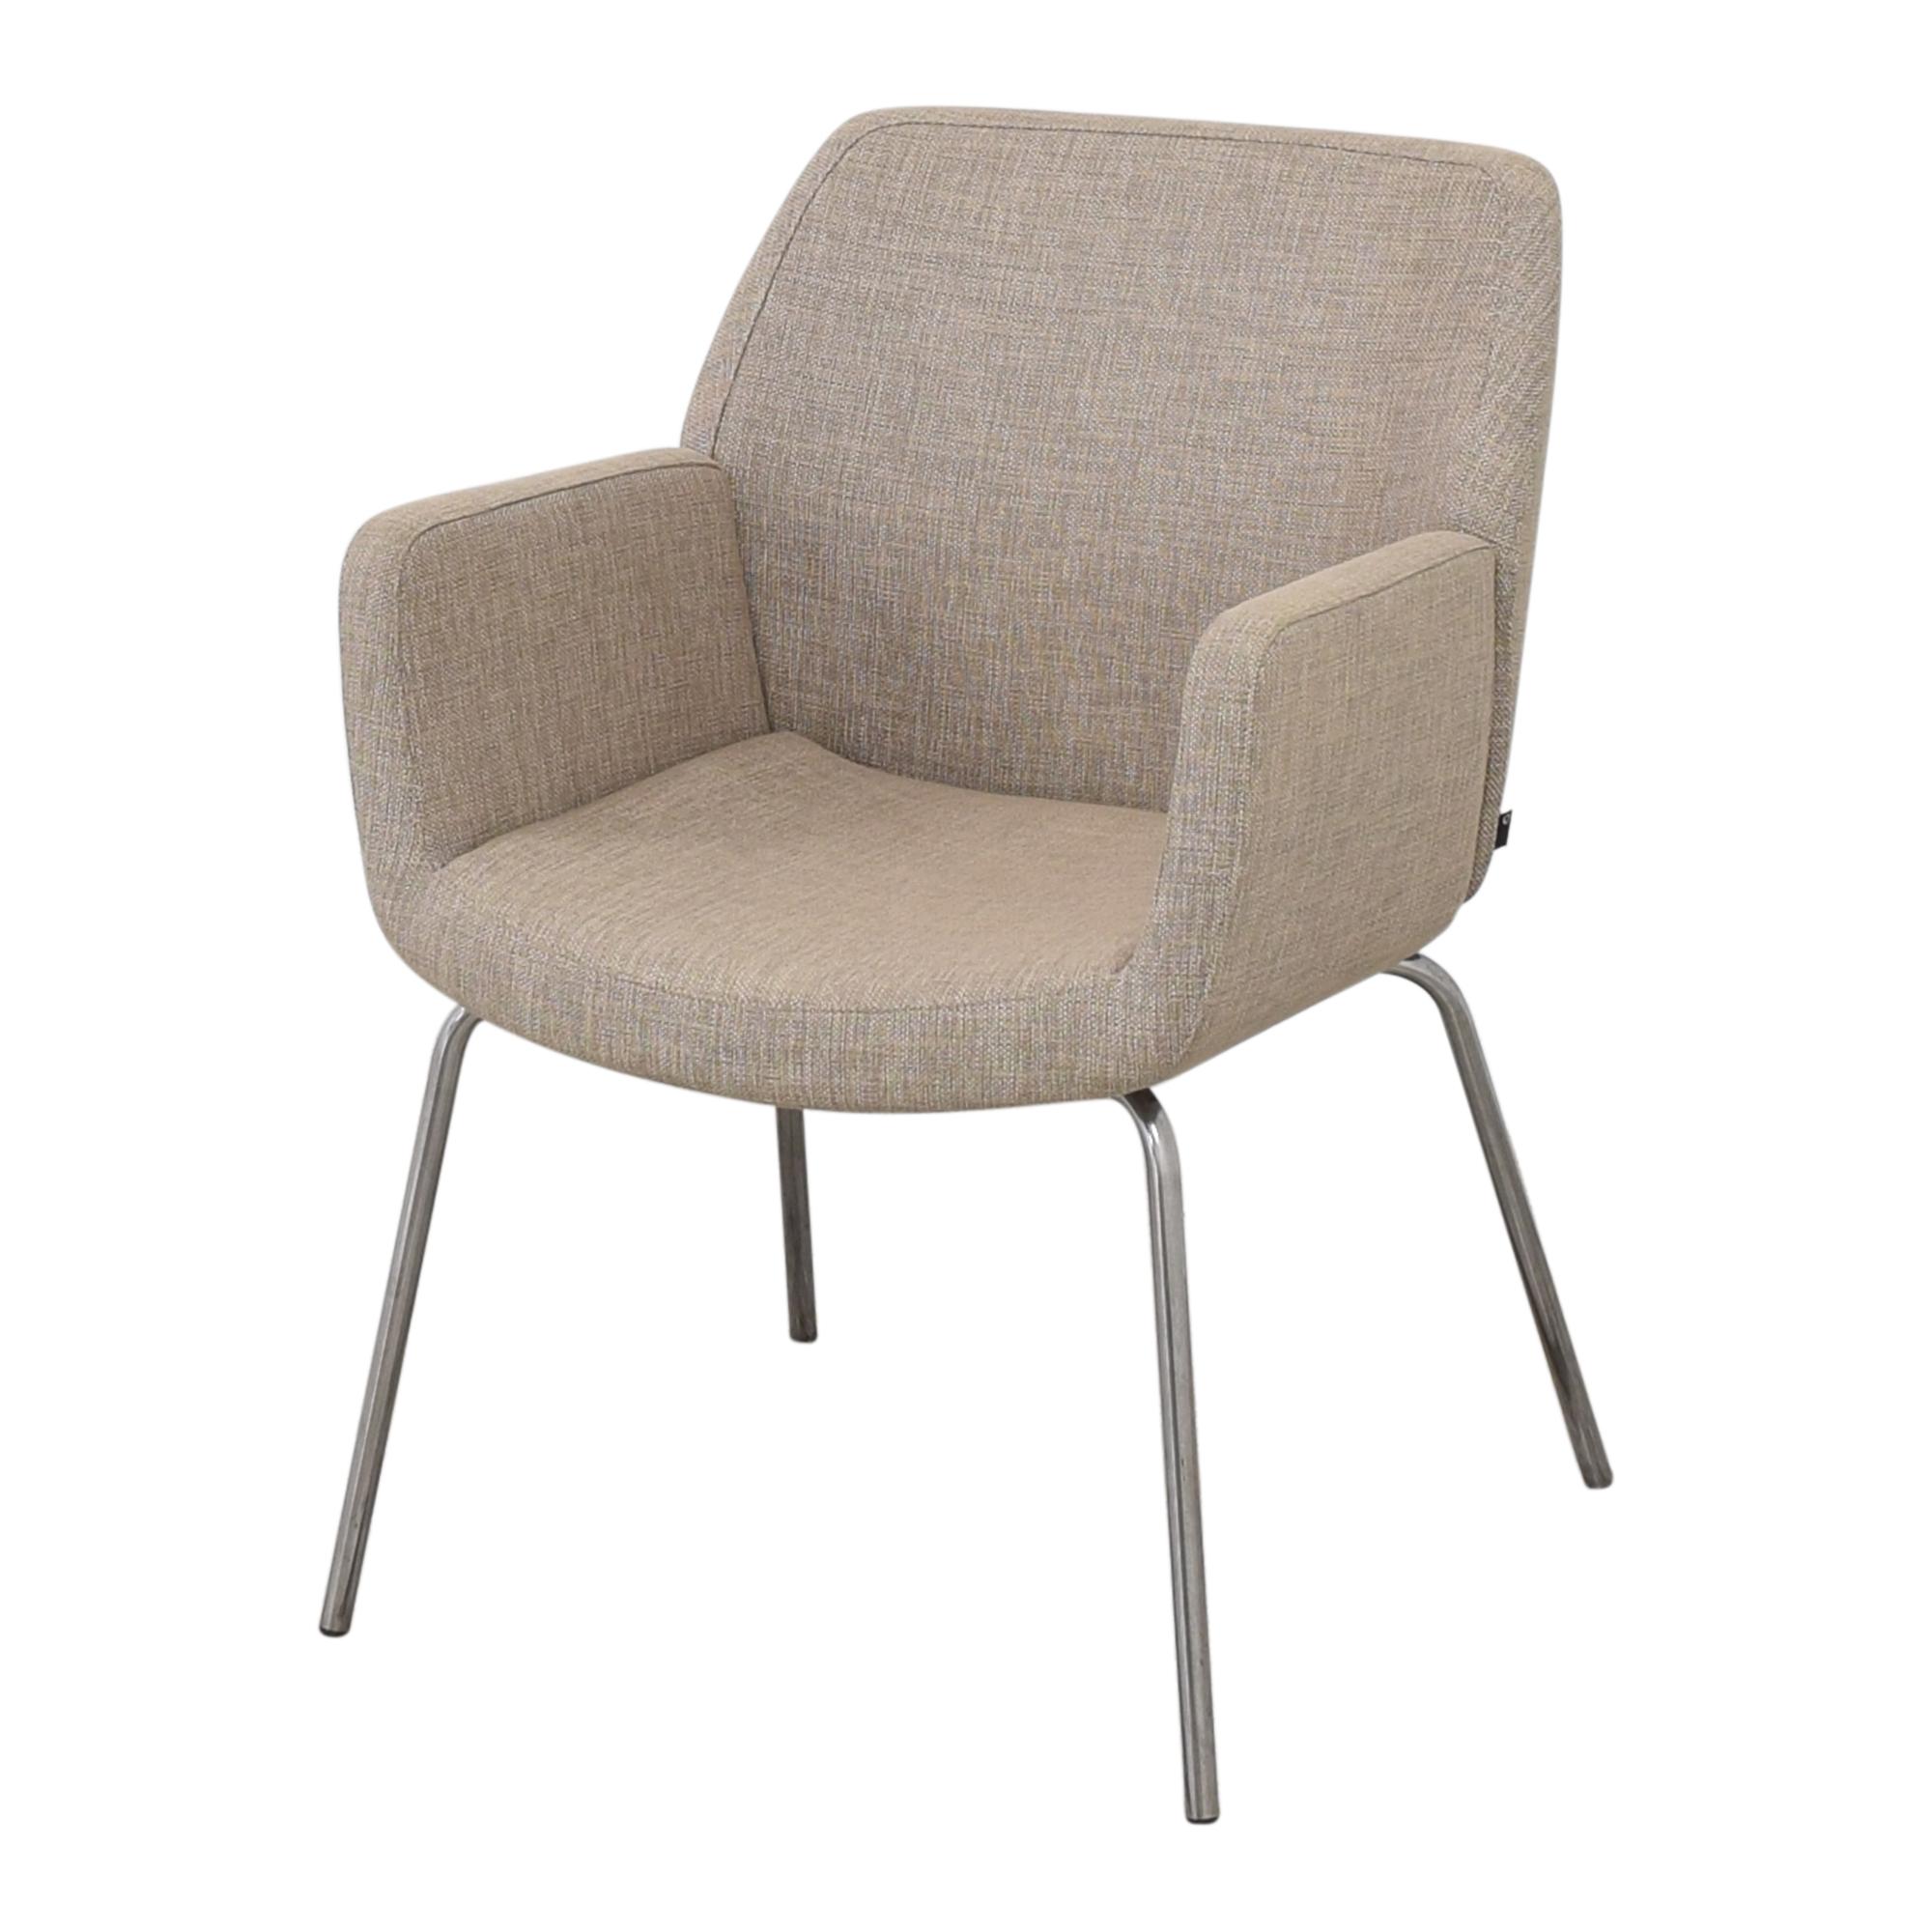 Steelcase Steelcase Coalesse Bindu Side Chair second hand